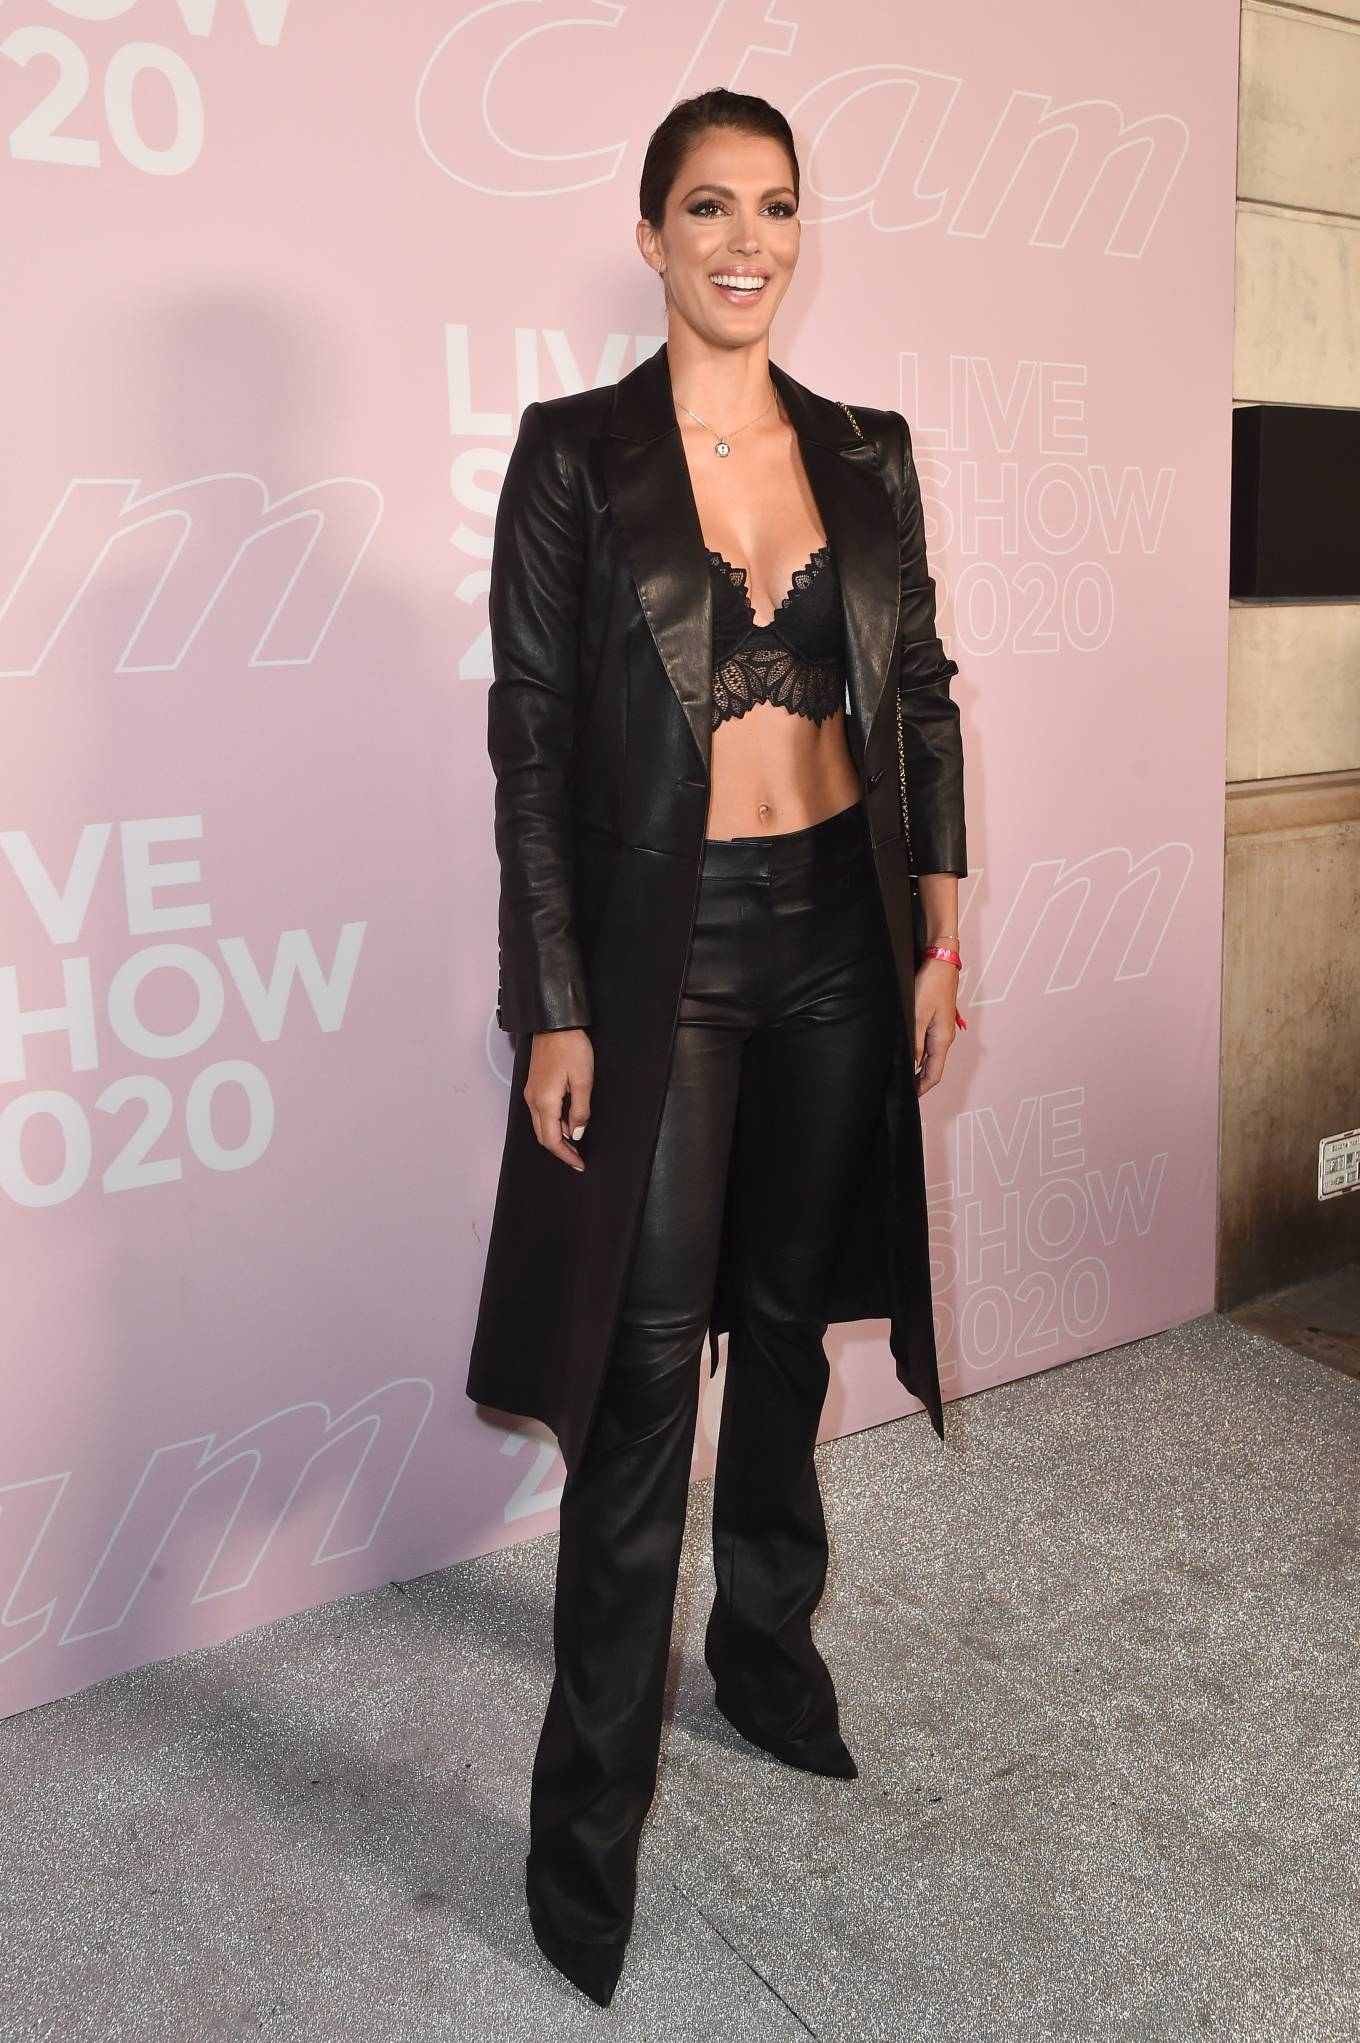 Iris Mittenaere 2020 : Iris Mittenaere – Etam show at Paris Fashion Week 2020-13